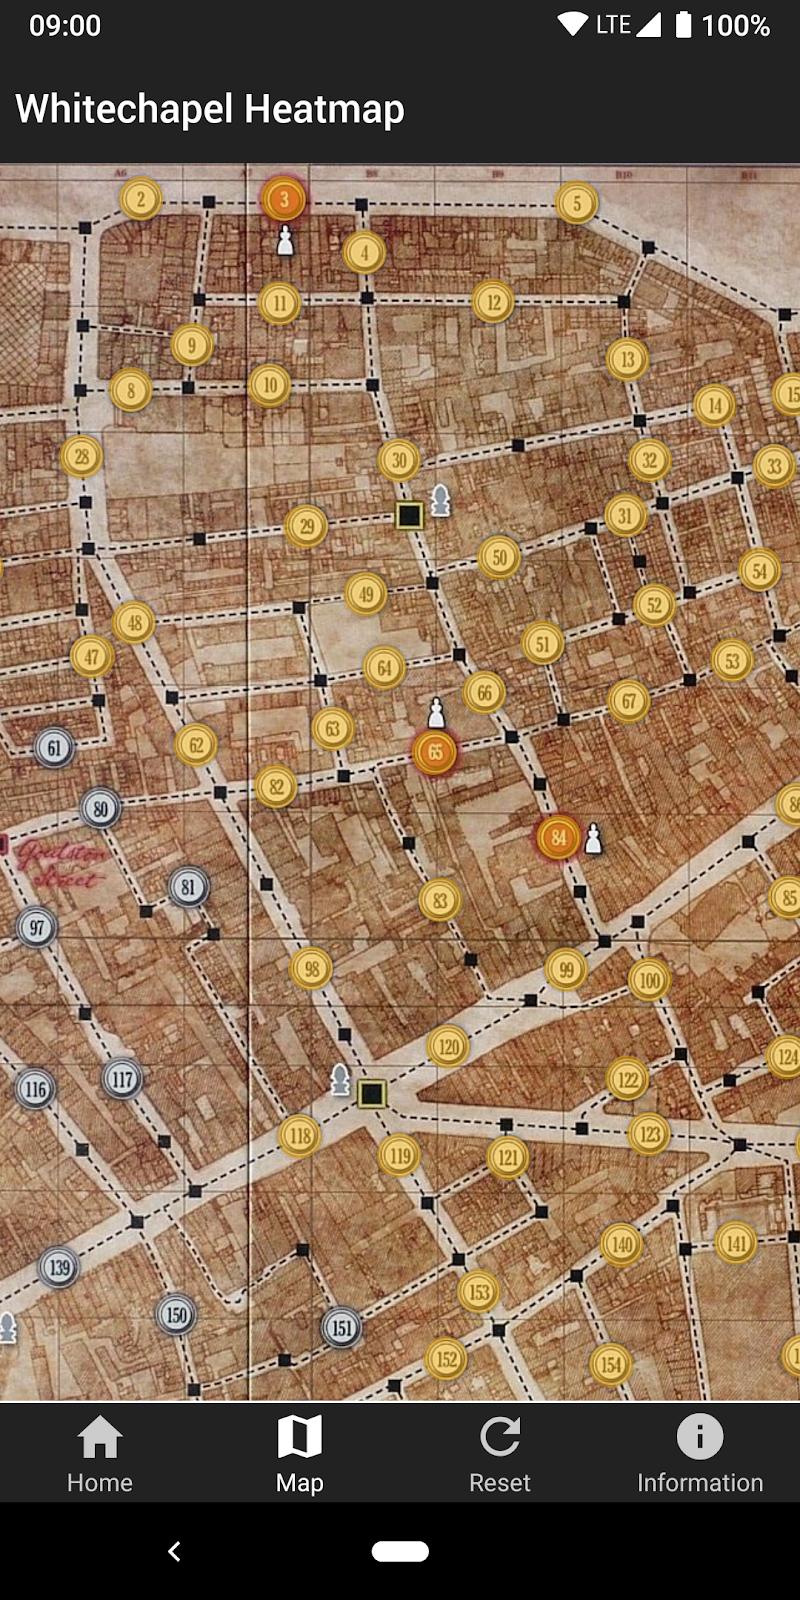 Whitechapel Heatmap Screenshot 2